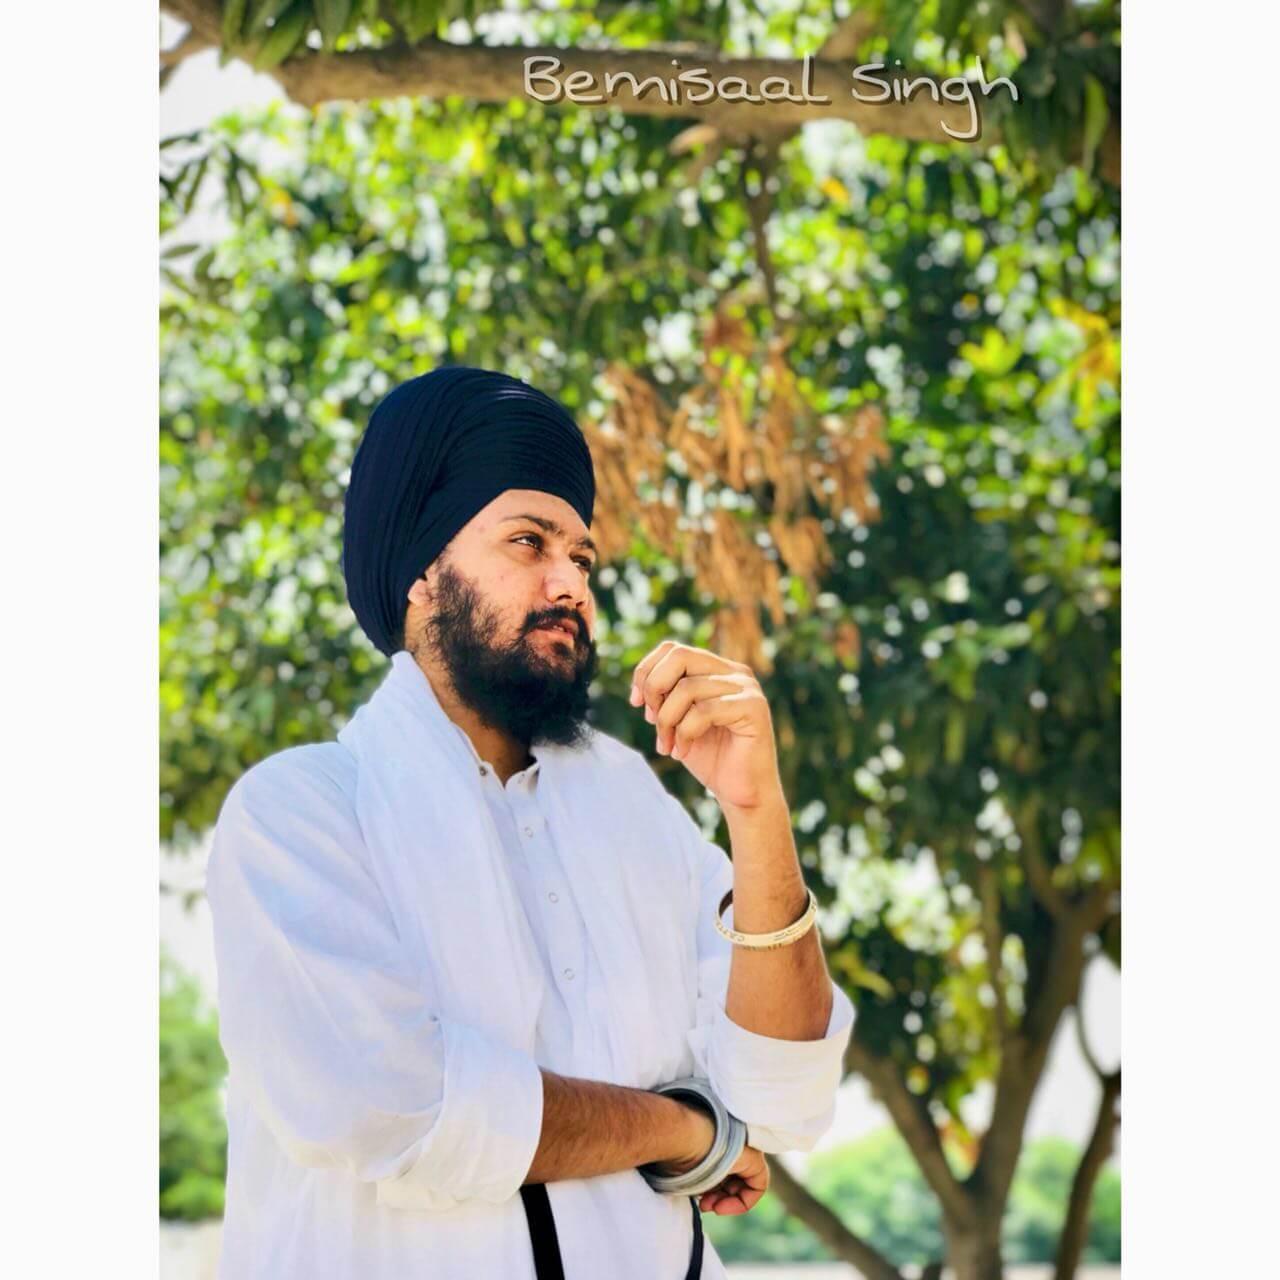 Bemisaal Singh